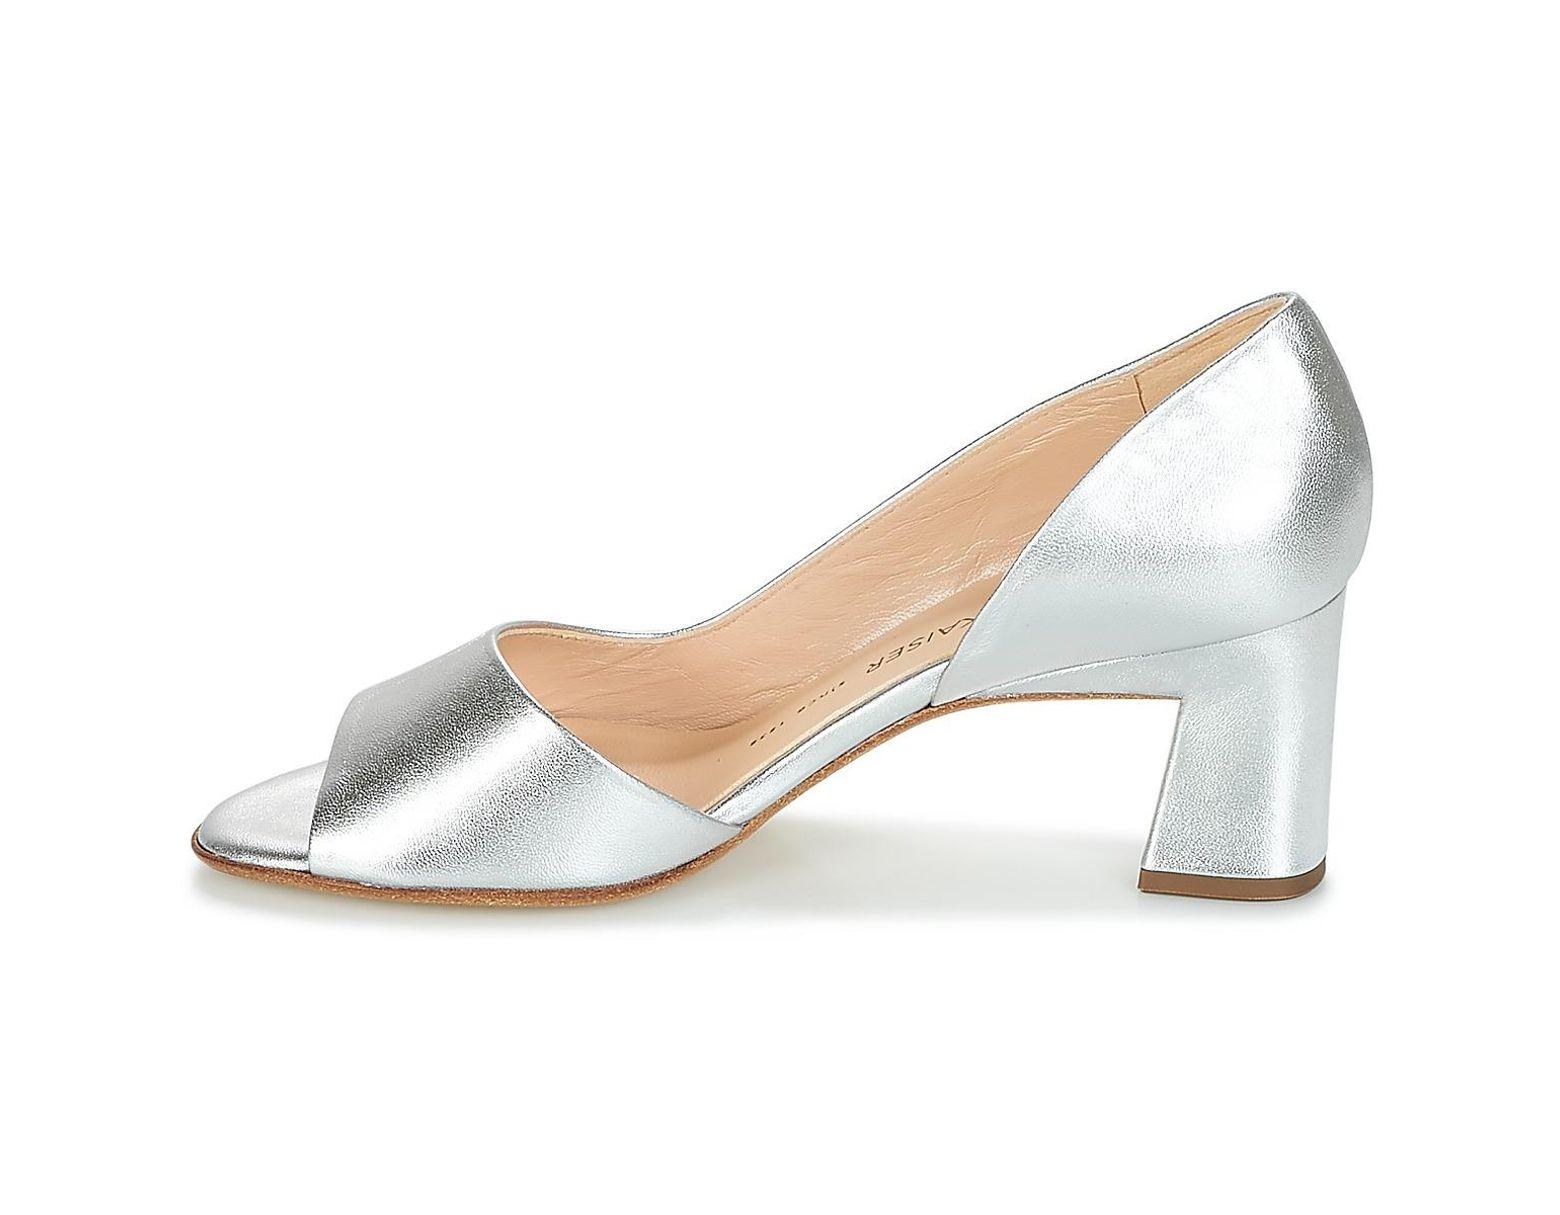 Sandals Women's Elana Silver Metallic In srCBtdxhQ